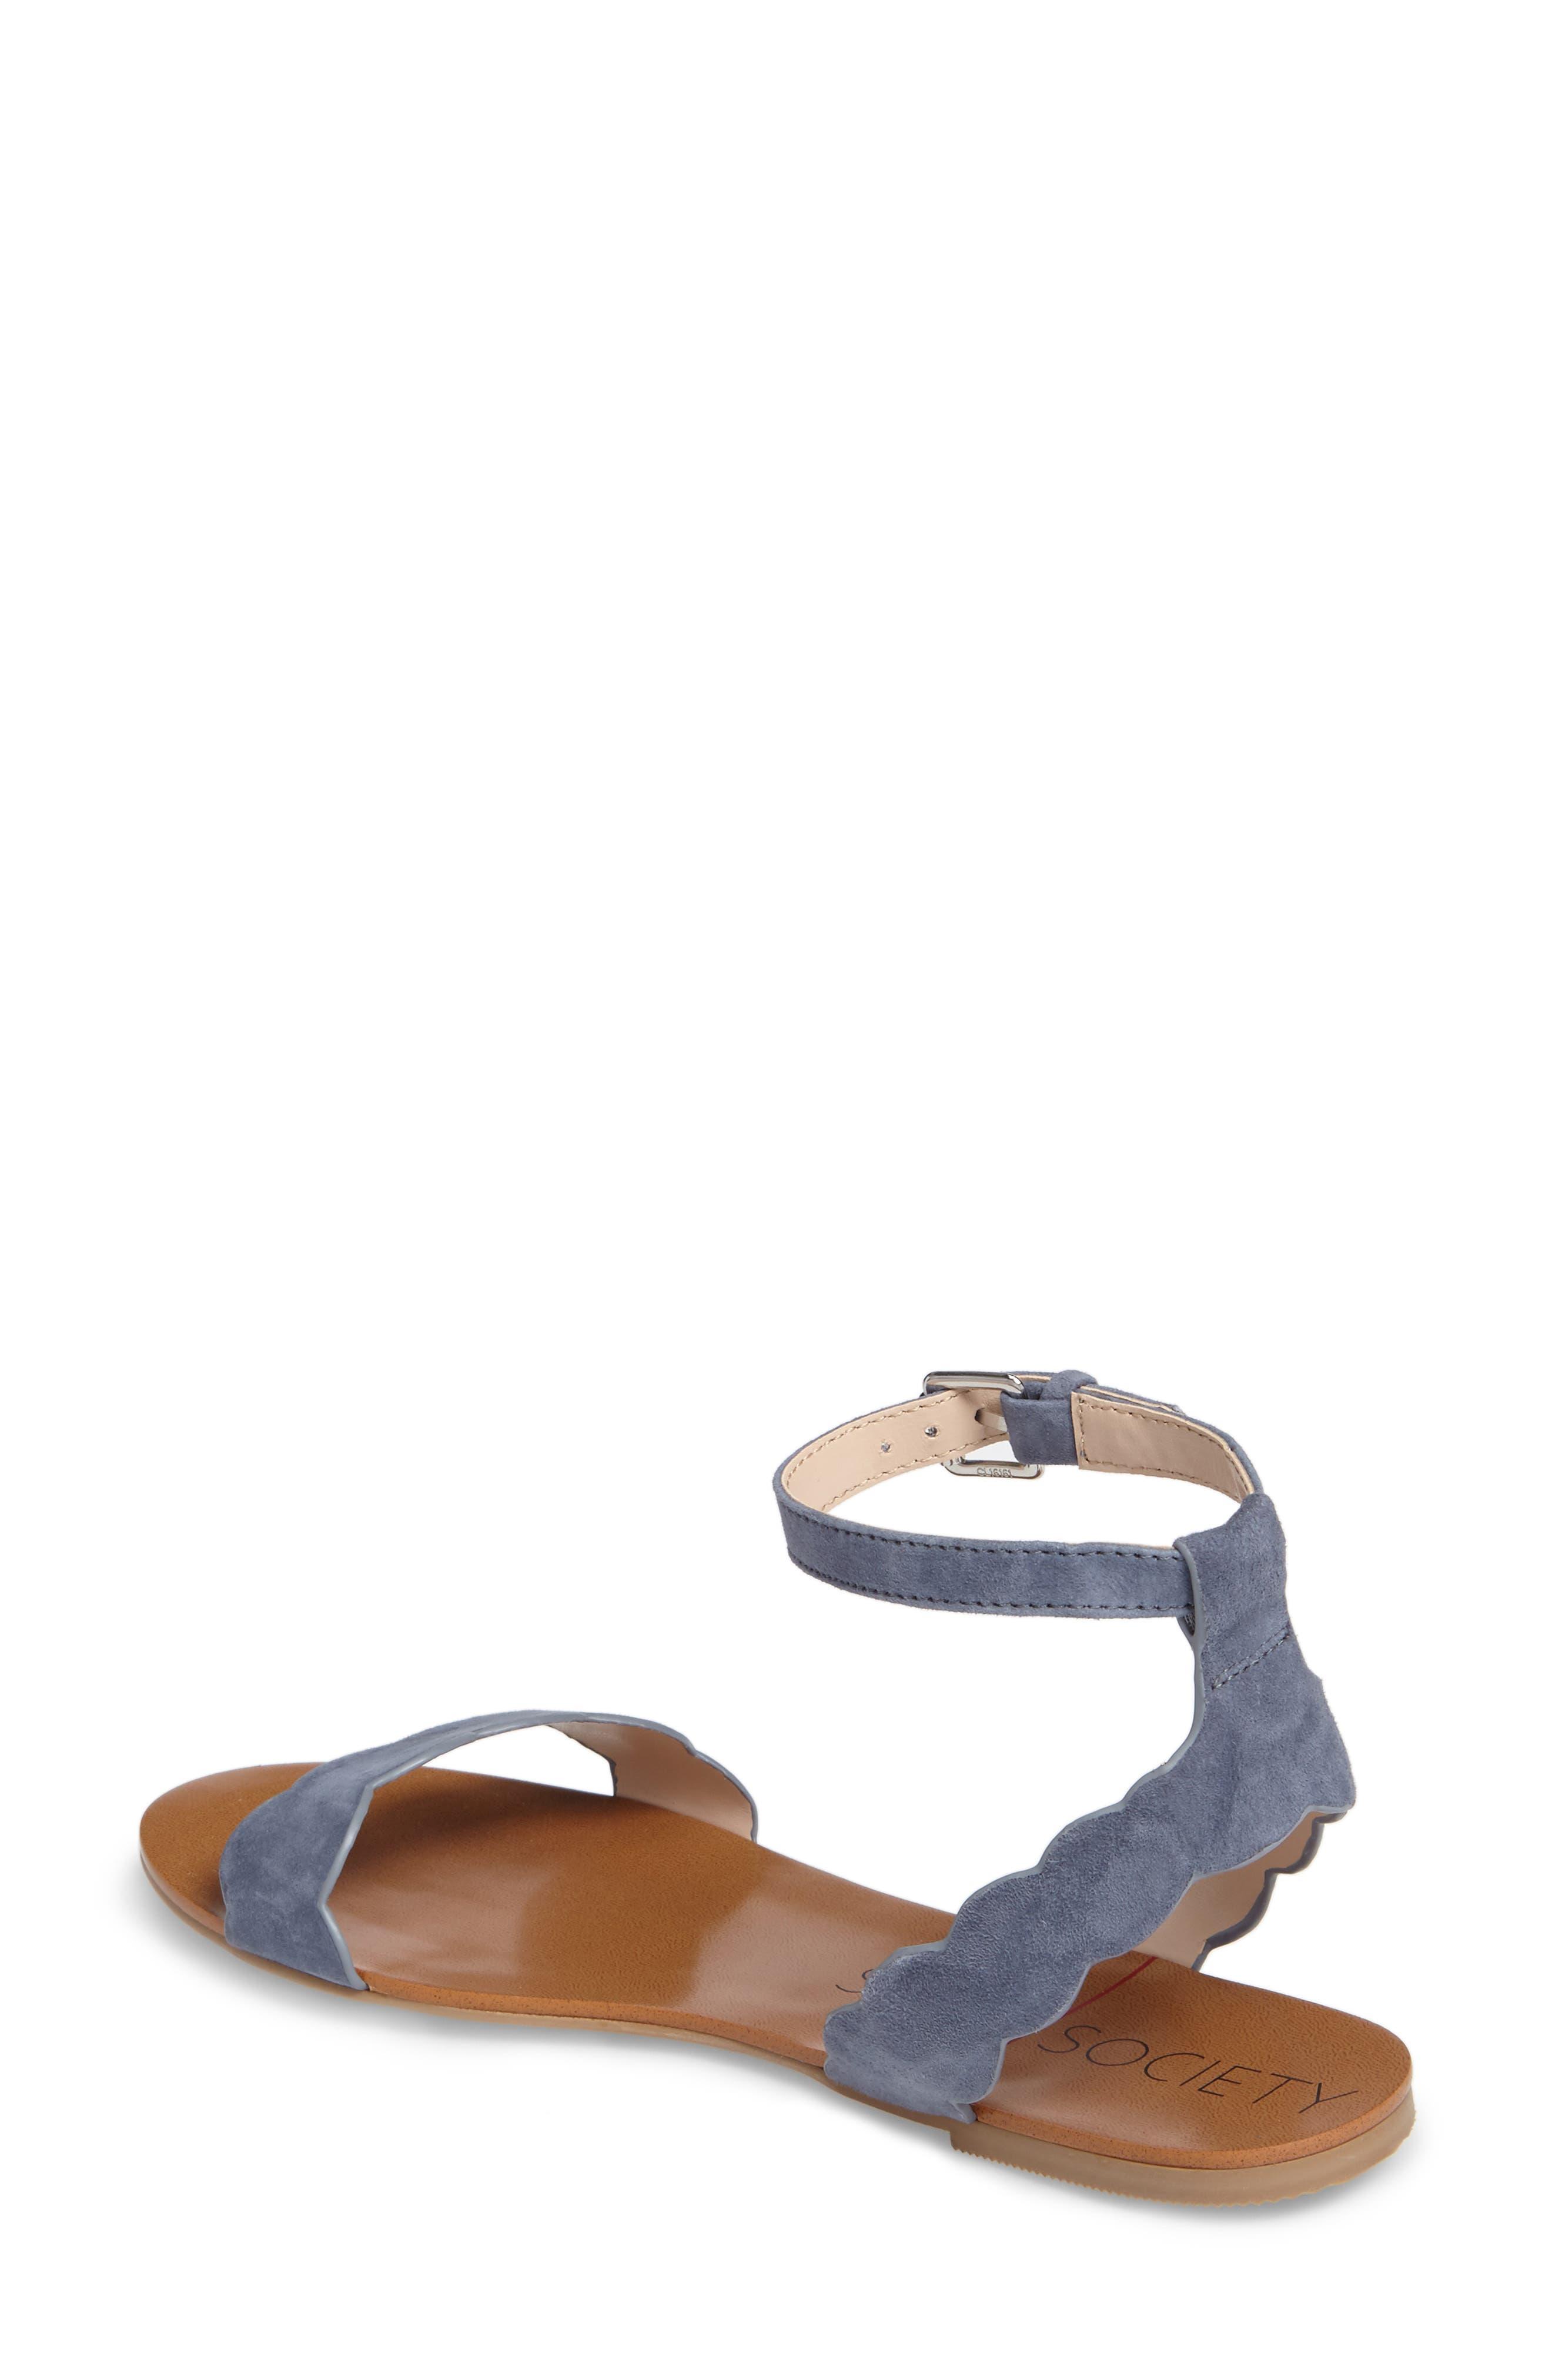 'Odette' Scalloped Ankle Strap Flat Sandal,                             Alternate thumbnail 13, color,